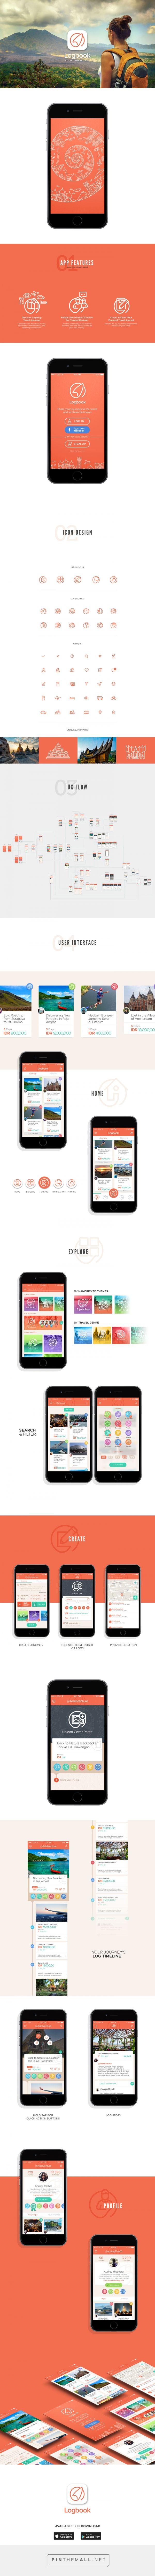 Devi Soewono | Logbook - App Design. http://www.devisoewono.com/design/logbook-app-design/